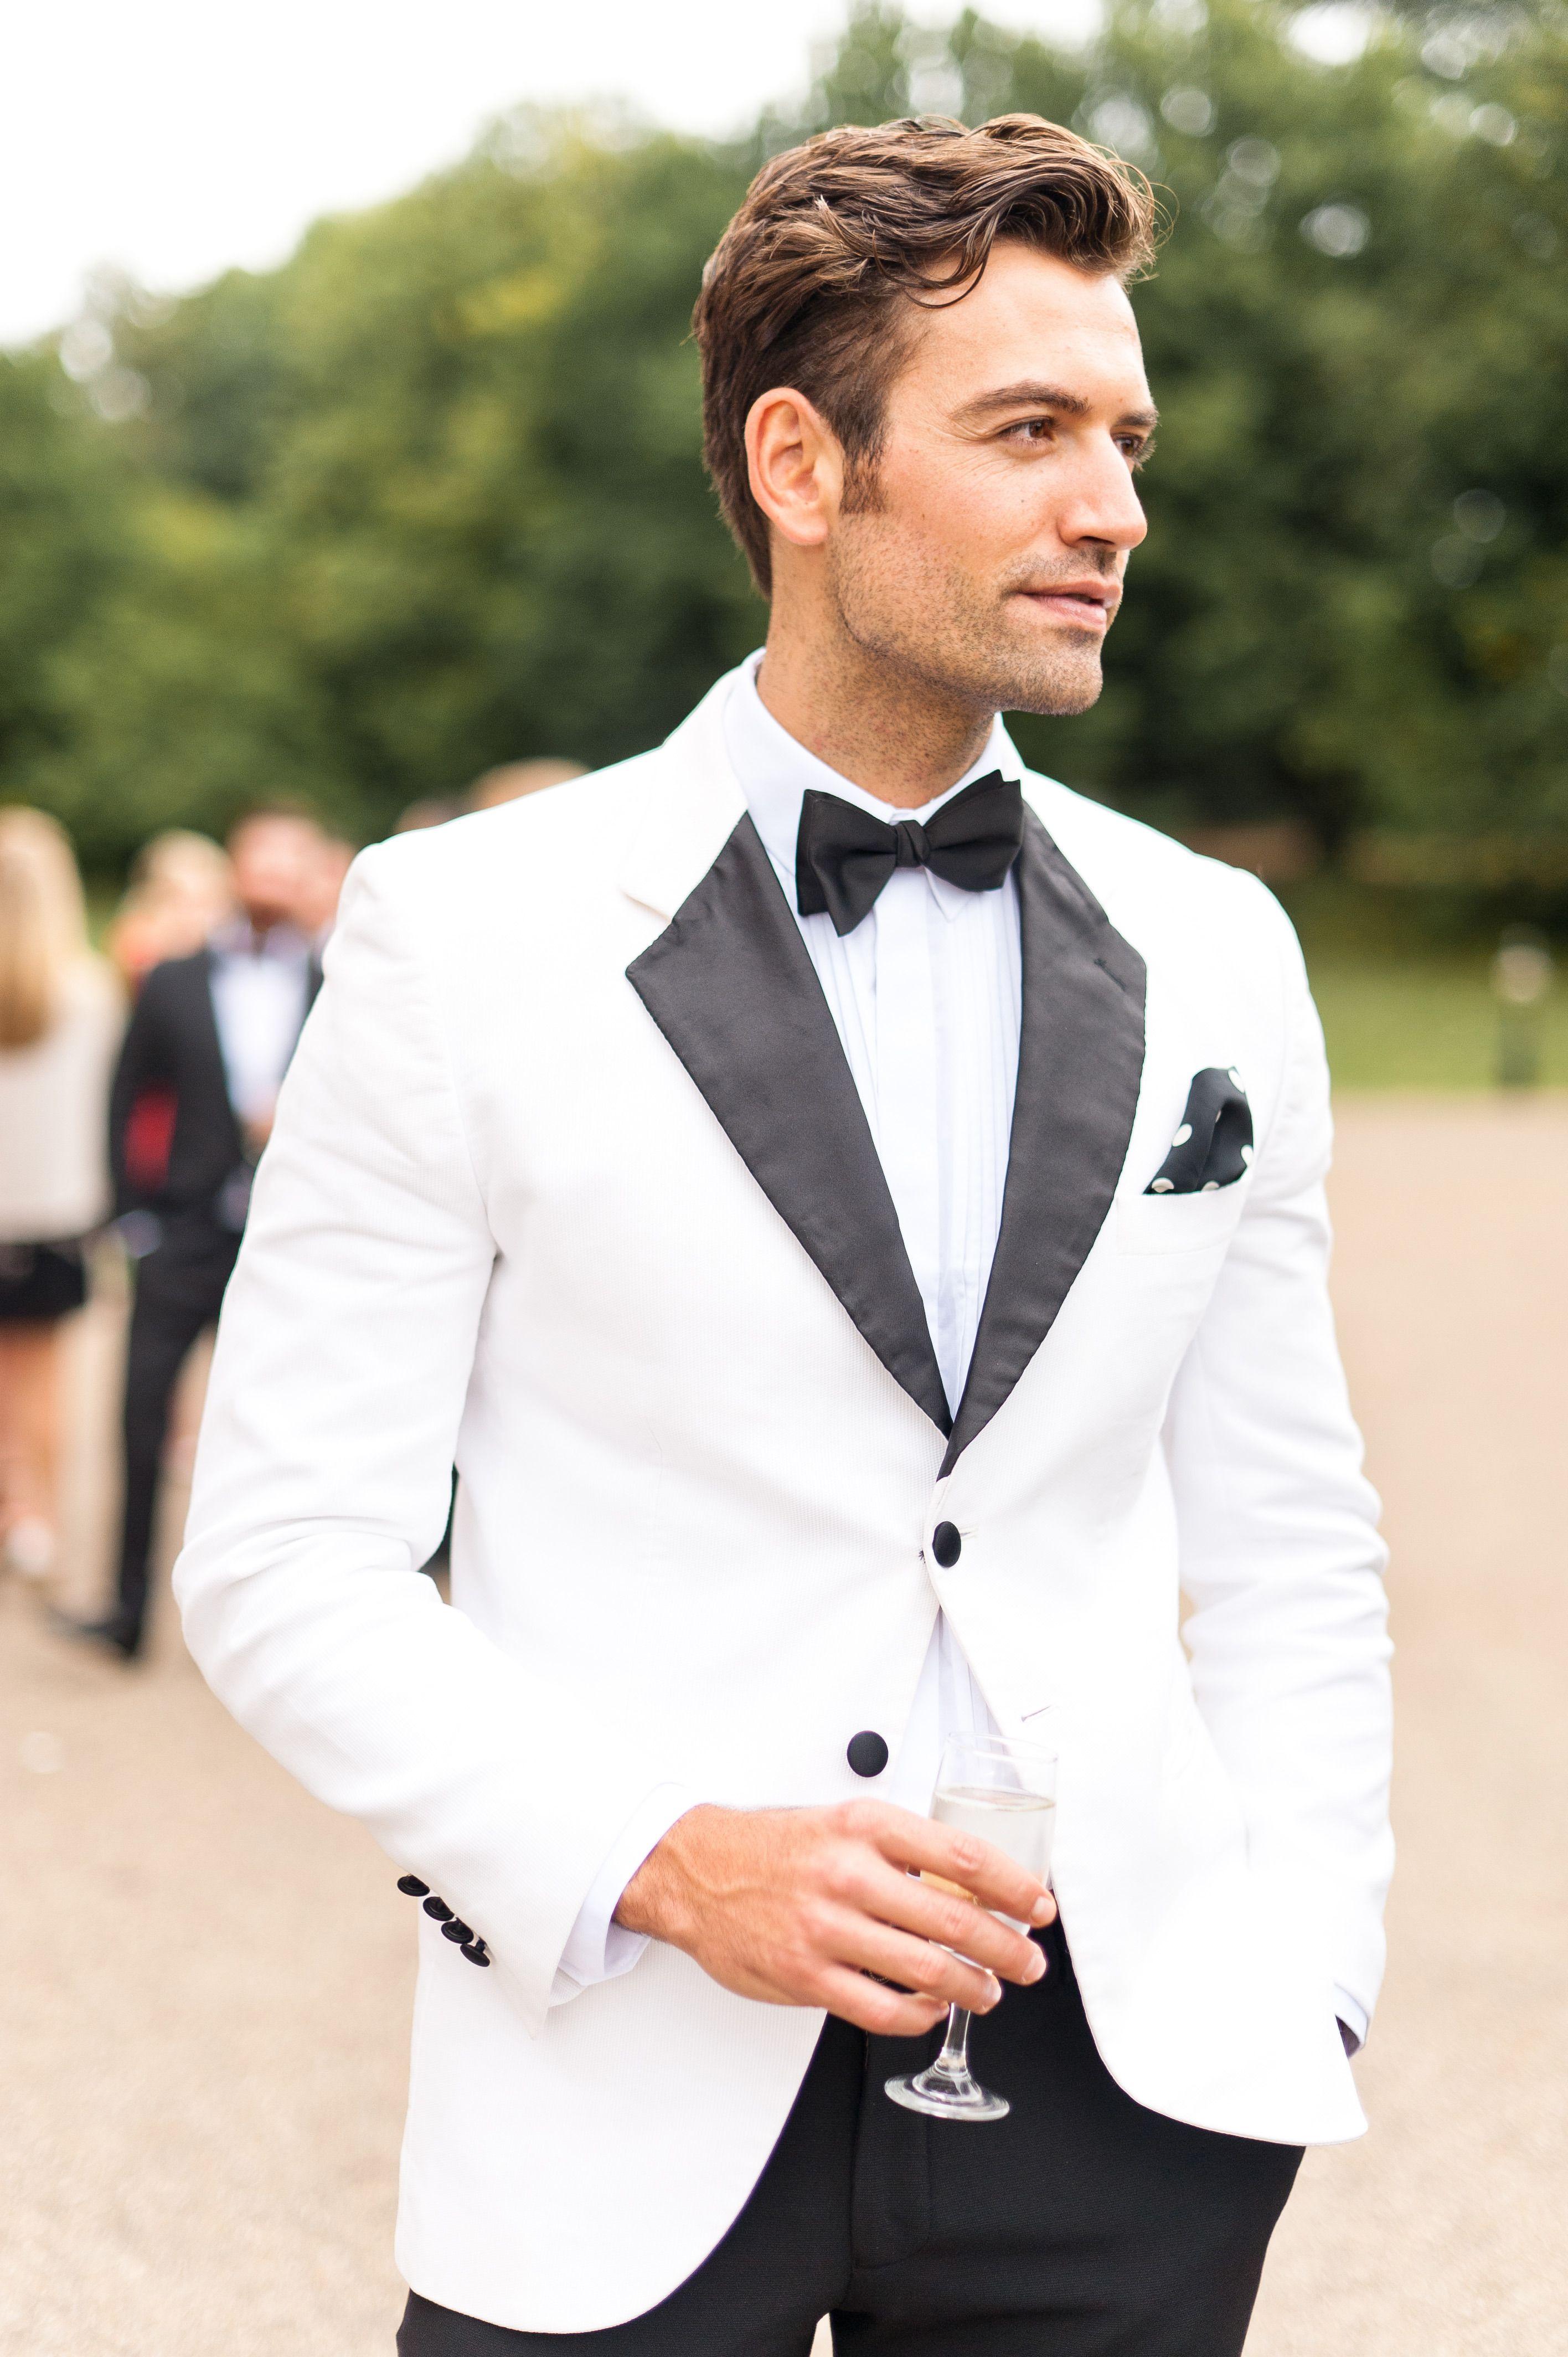 Romantic british wedding at brocket hall jay gatsby gatsby and